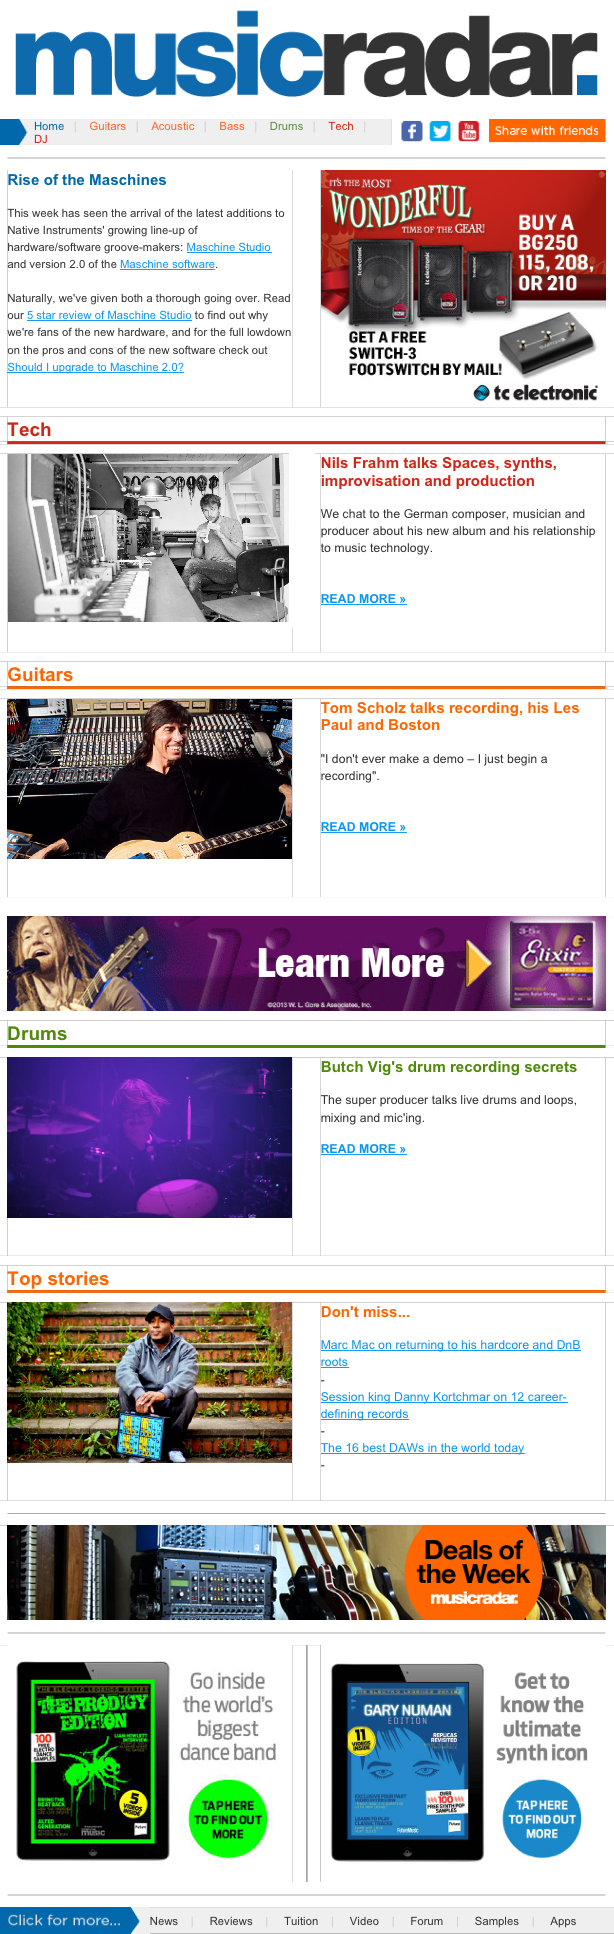 MusicRadar Newsletter